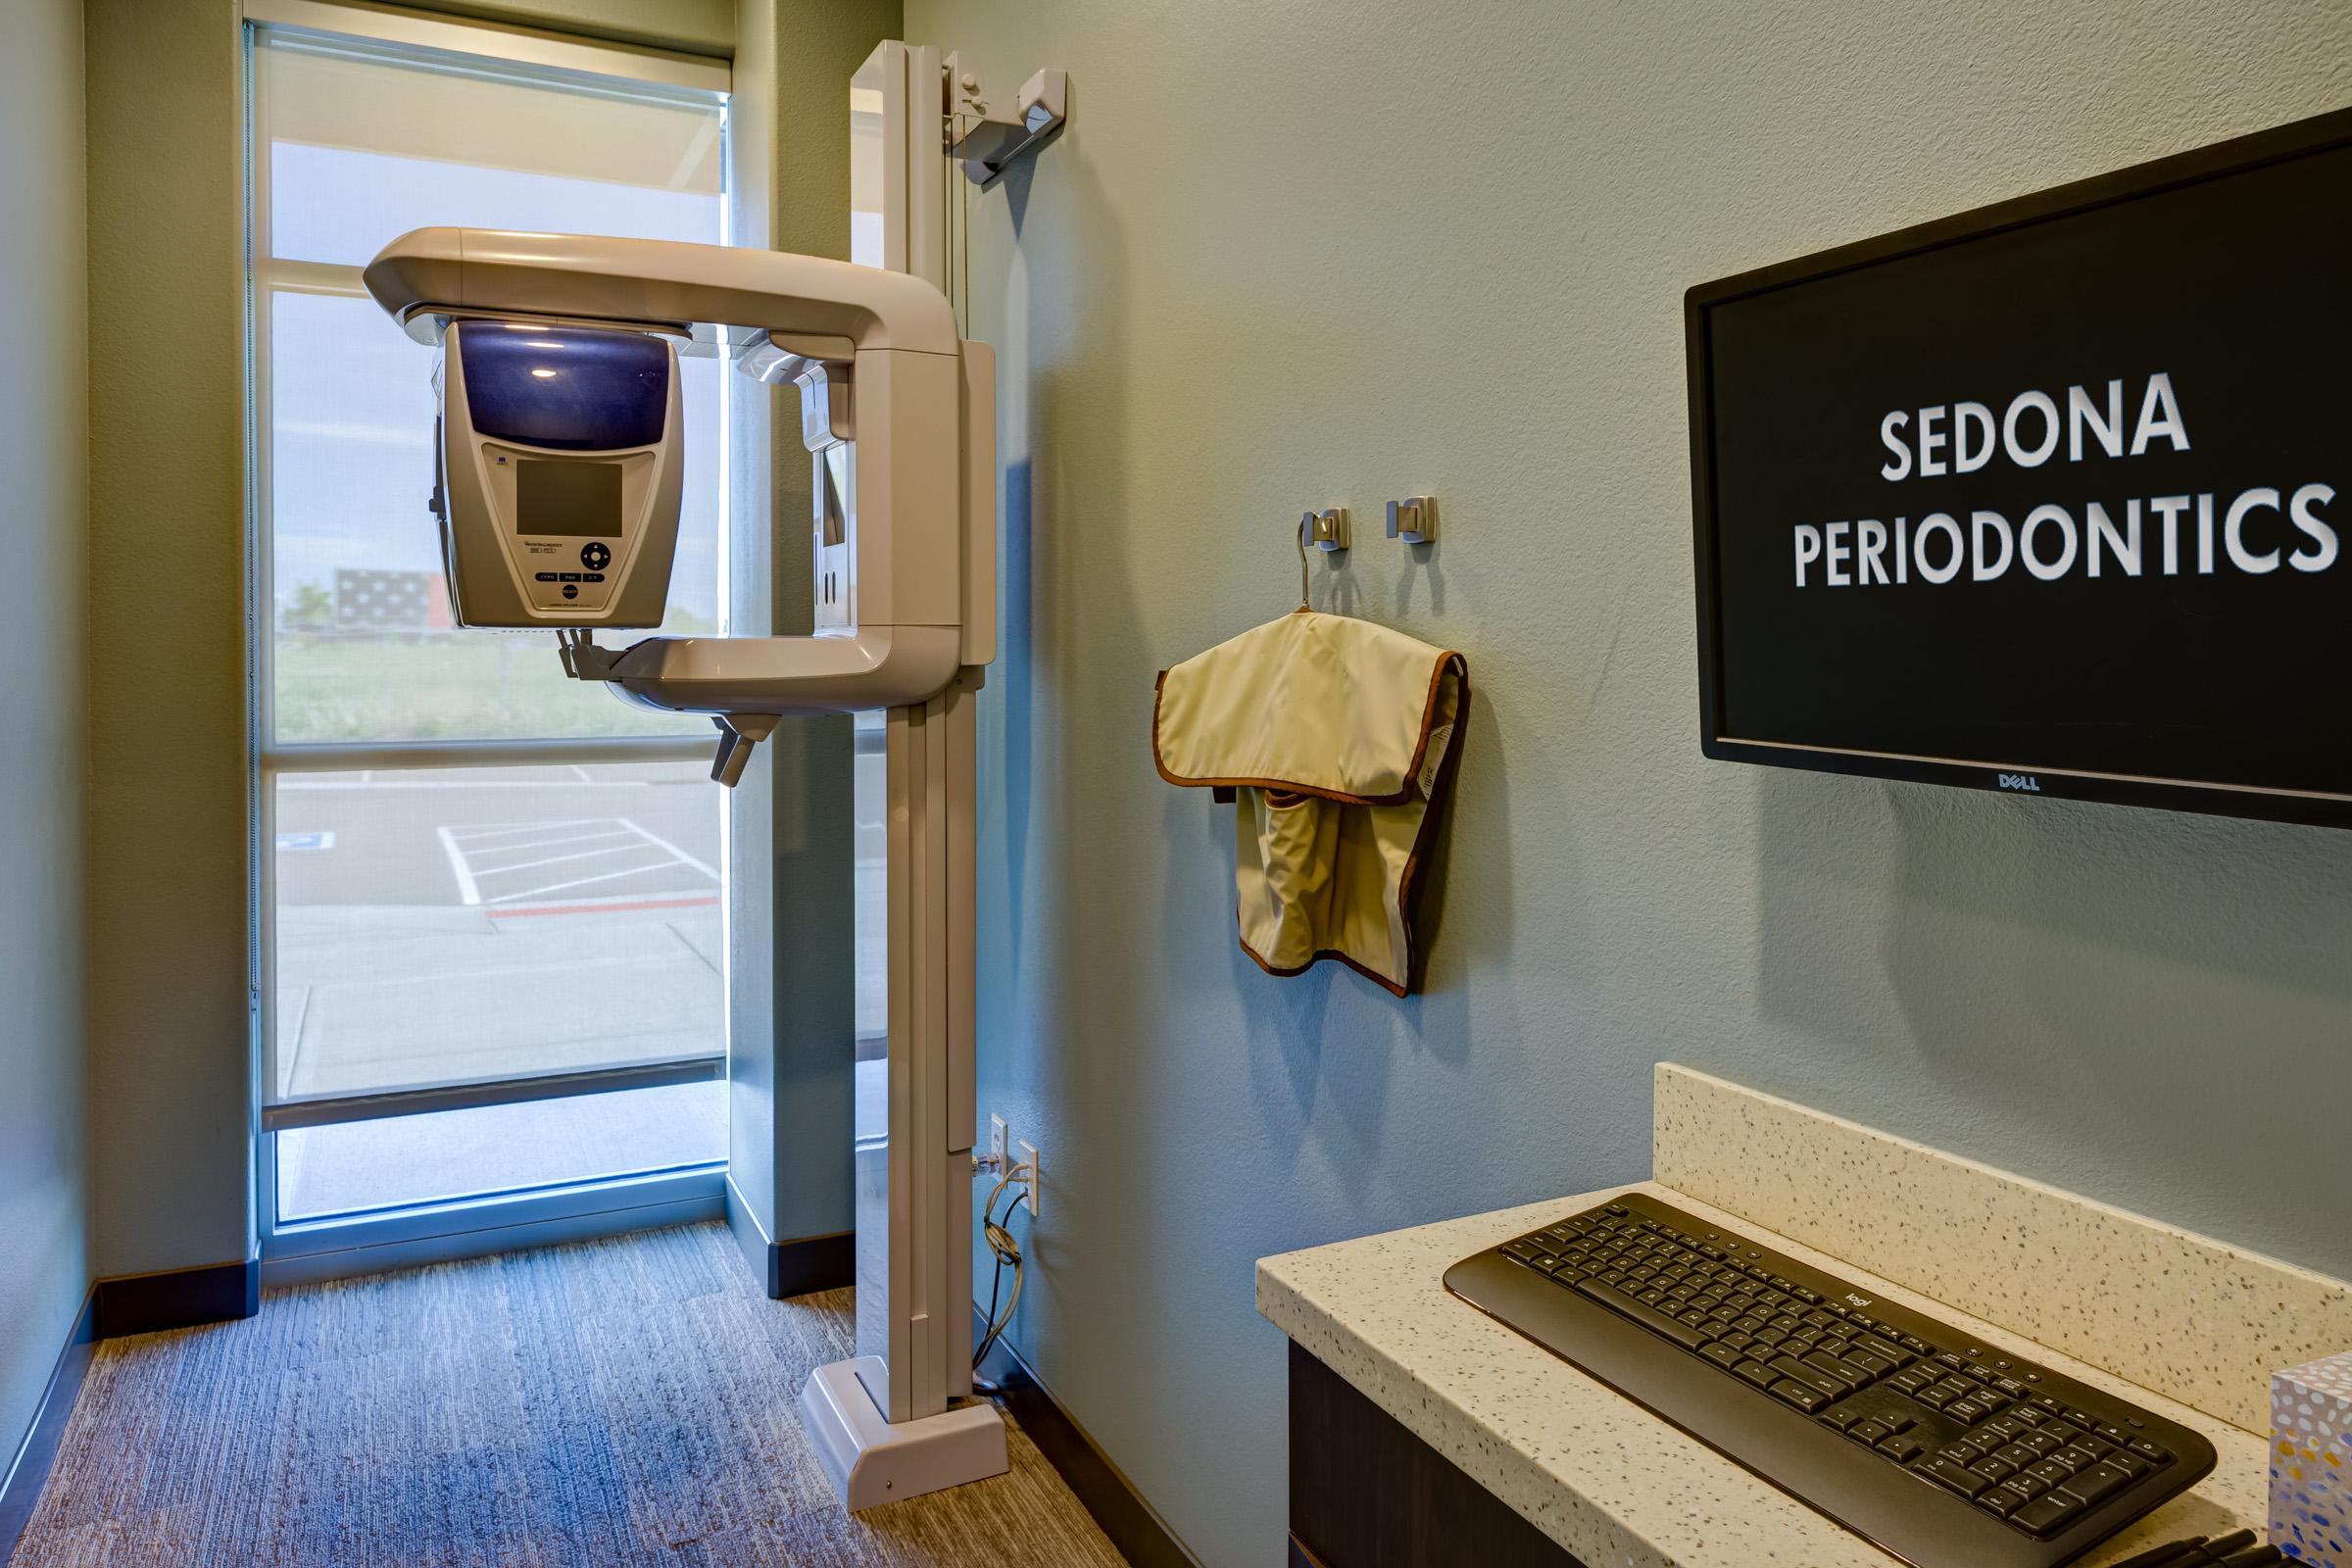 Sedona-Periodontics-Westminster-0016.jpg